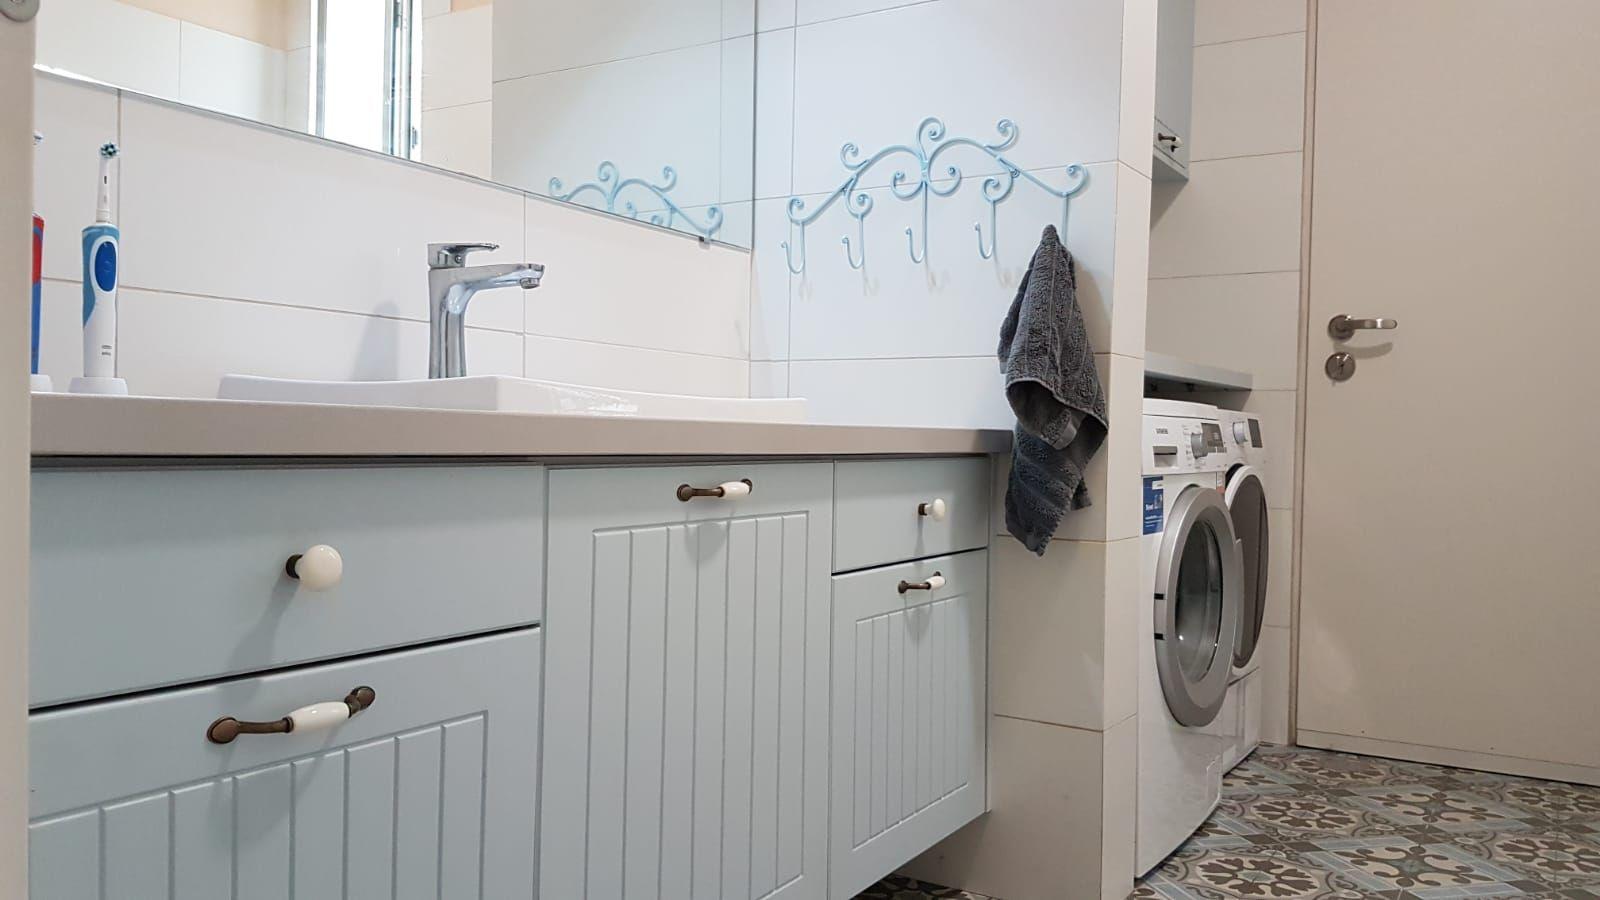 Pin By Shaham Glazer On מקלחות Kitchen Cabinets Decor Home